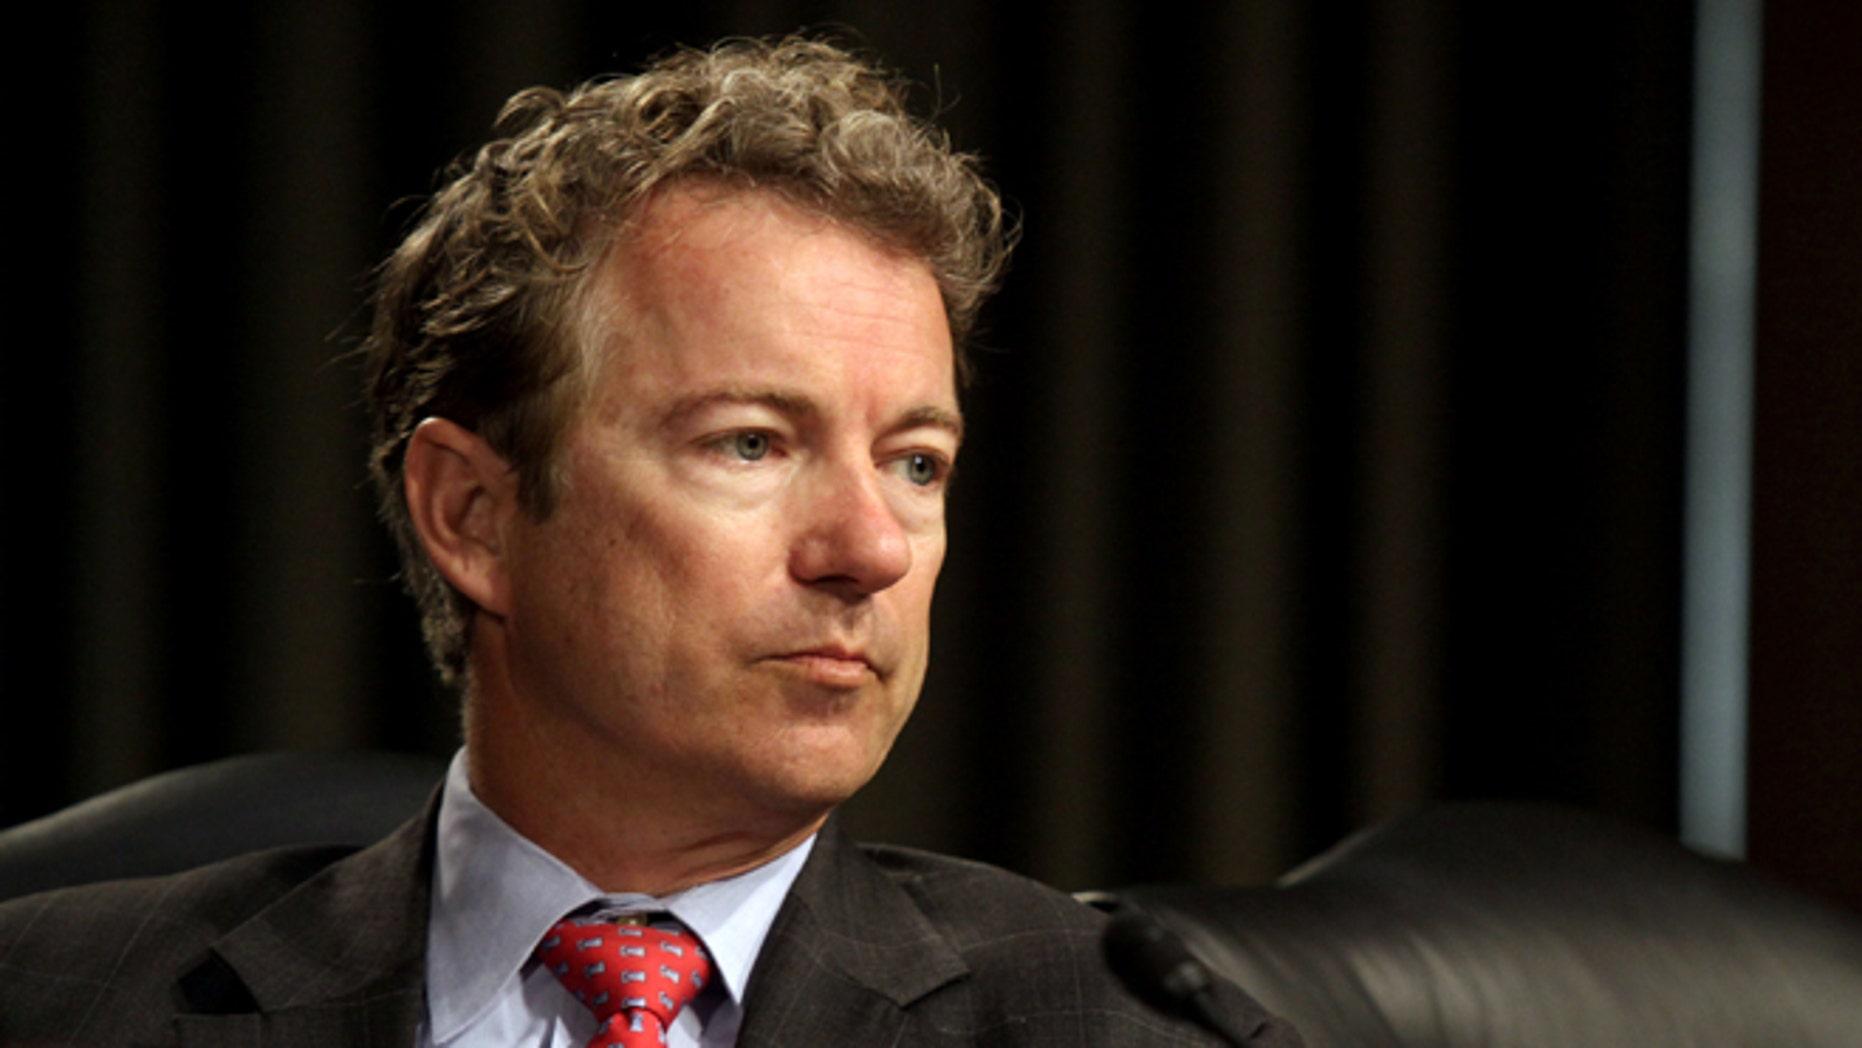 FILE: April 1, 2014: Sen. Rand Paul, R-Ky., on Capitol Hill in Washington, D.C.